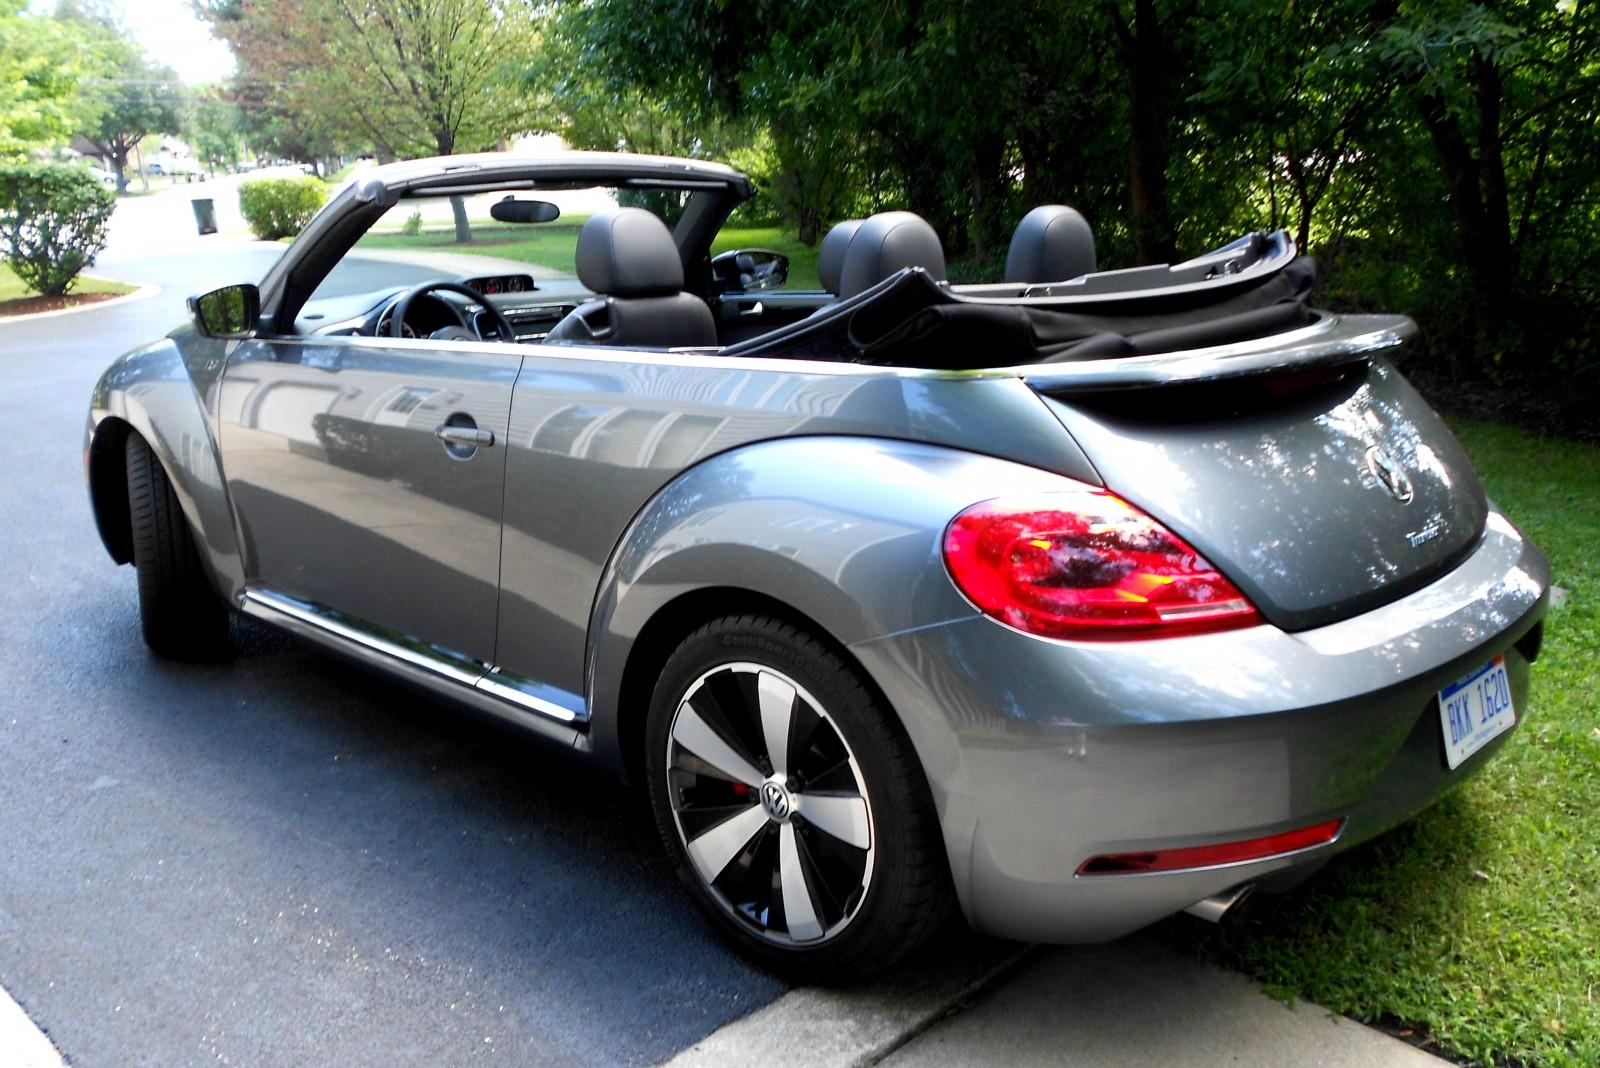 road test review 2014 volkswagen beetle r line convertible 10. Black Bedroom Furniture Sets. Home Design Ideas